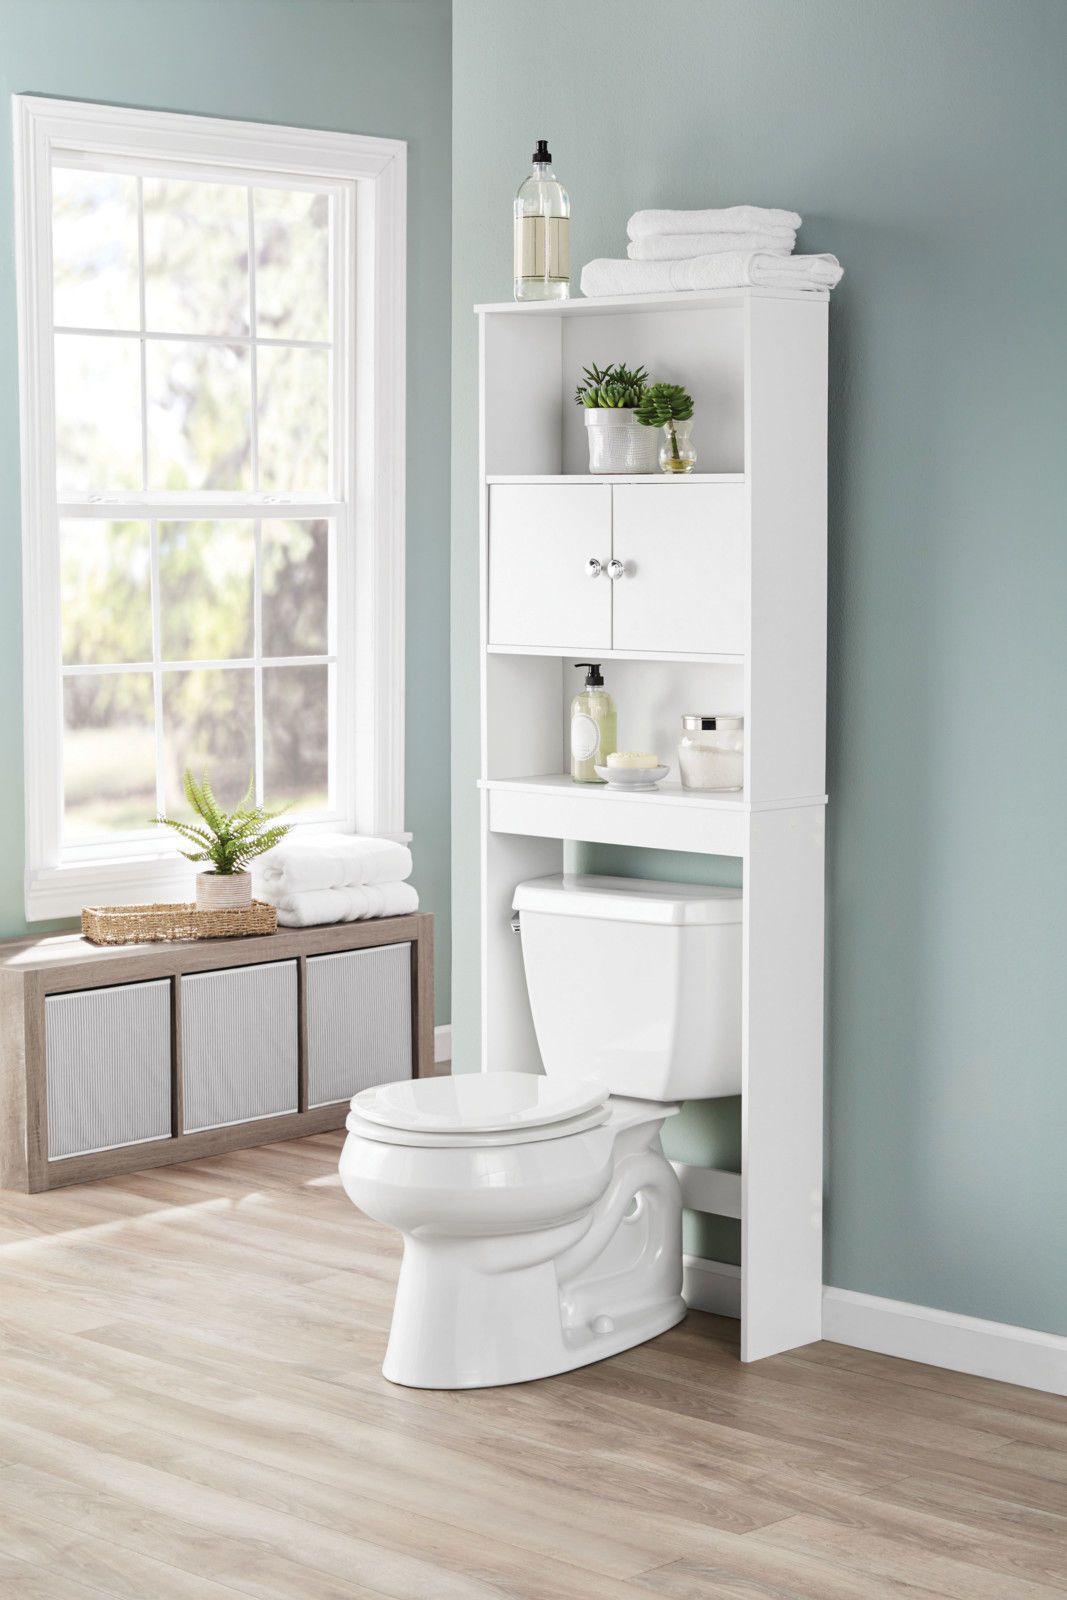 Mainstays Bathroom Over The Toilet Shelf White 43197160355 Ebay